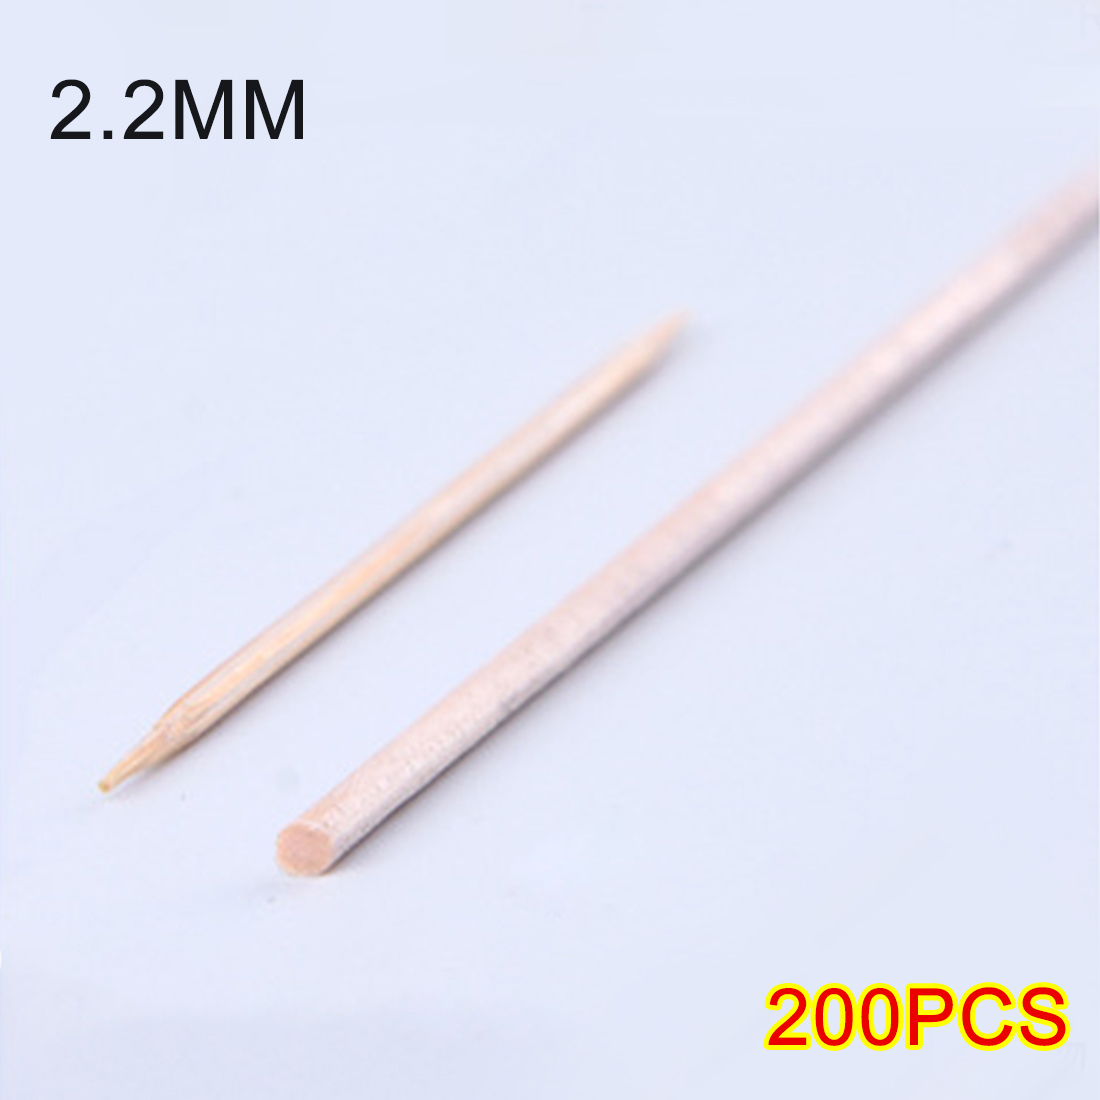 200Pcs 14.8cm(L) 2.2mm(D) Birch Wooden Stick For DIY Sand Table Layout Architecture Model